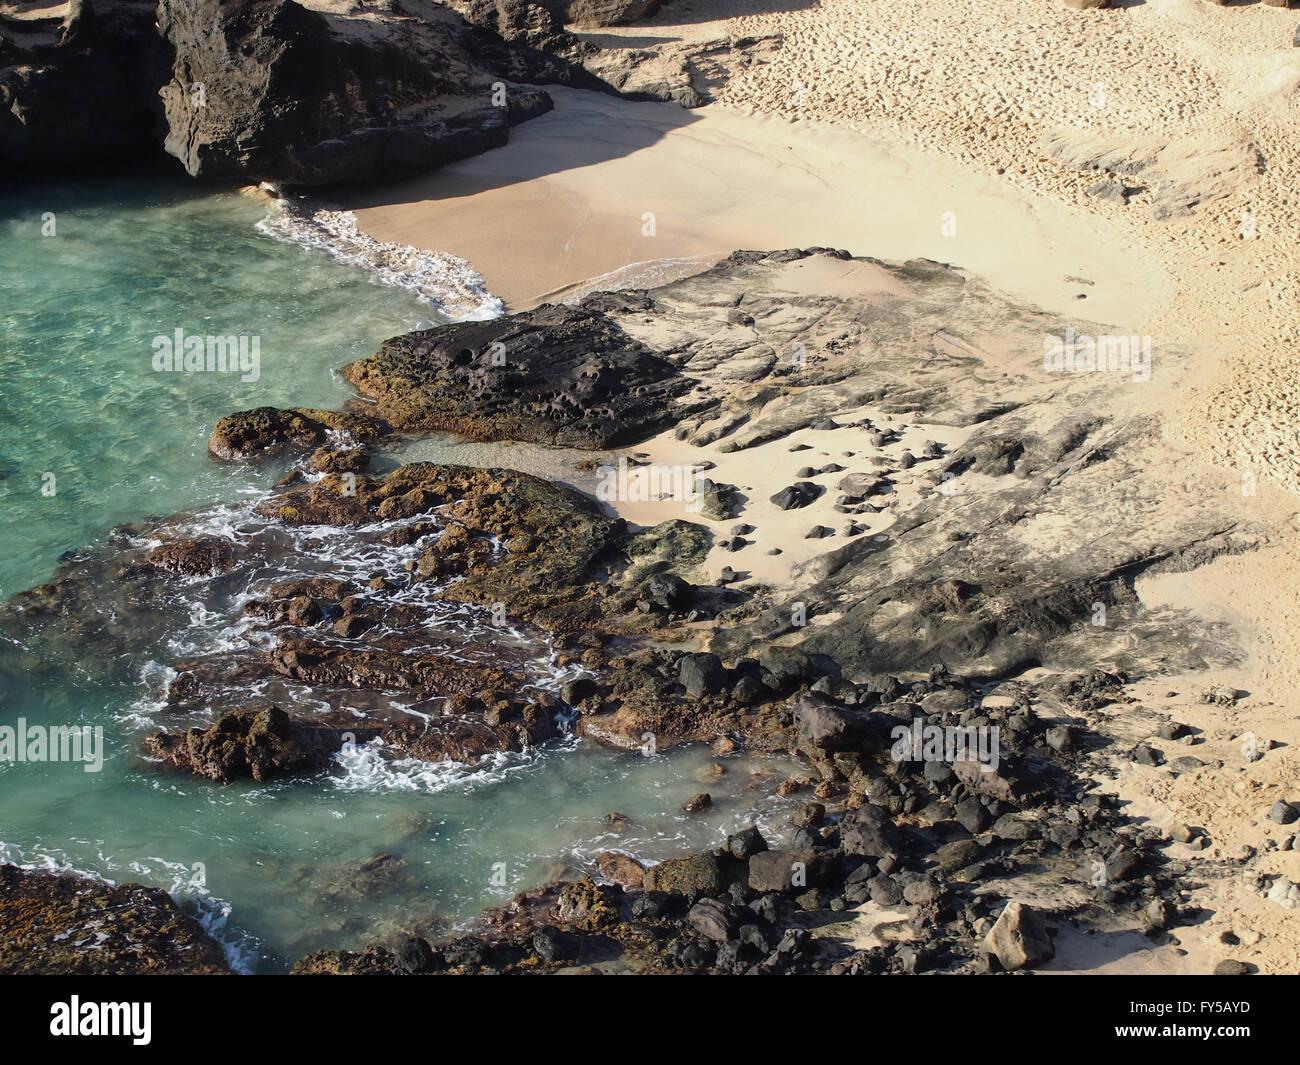 Secret Beach - Oahu, Hawaii viewed from above. Stock Photo